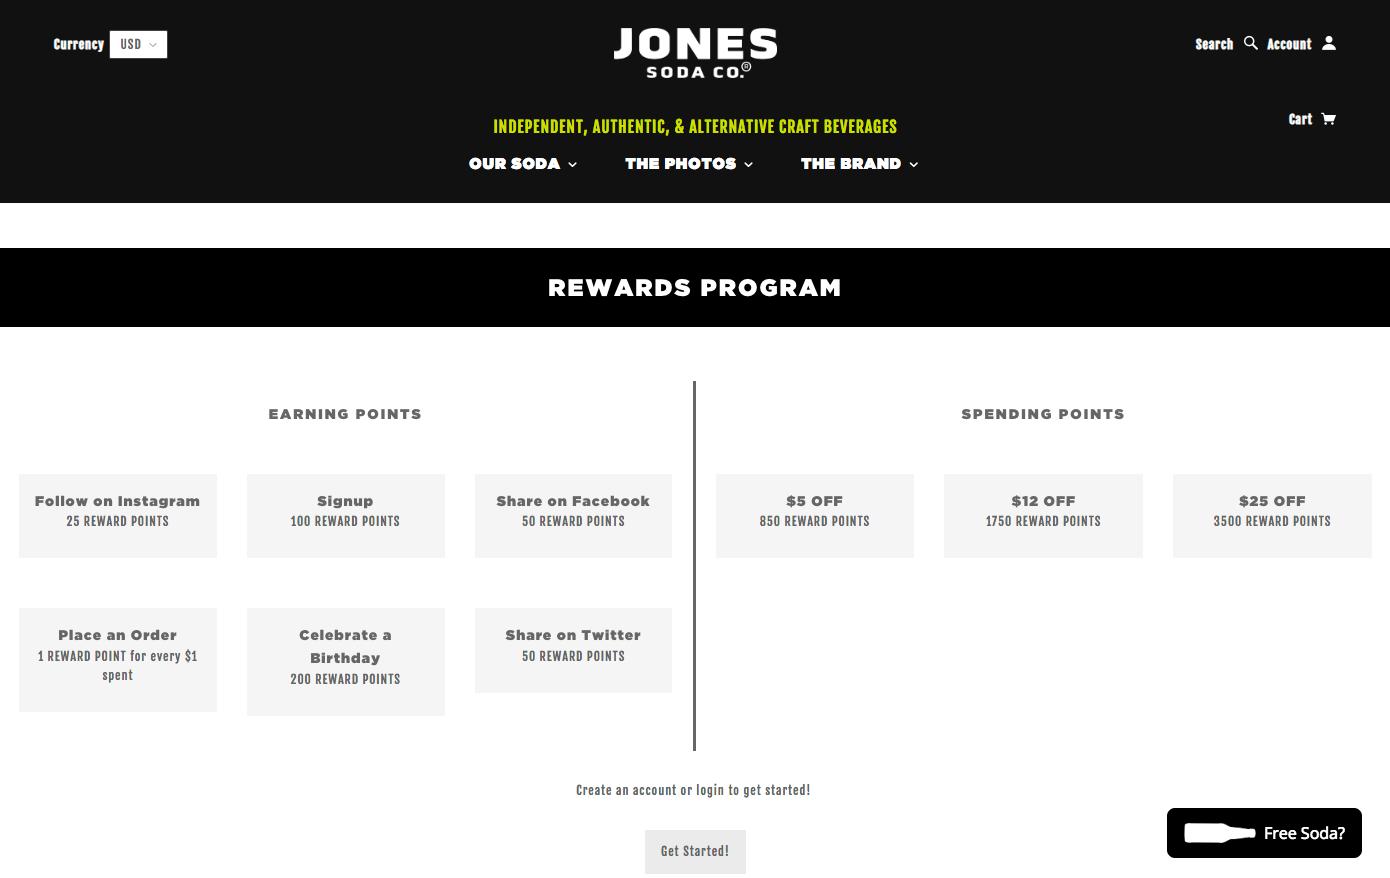 The Best eCommerce Loyalty Programs - Jones Soda